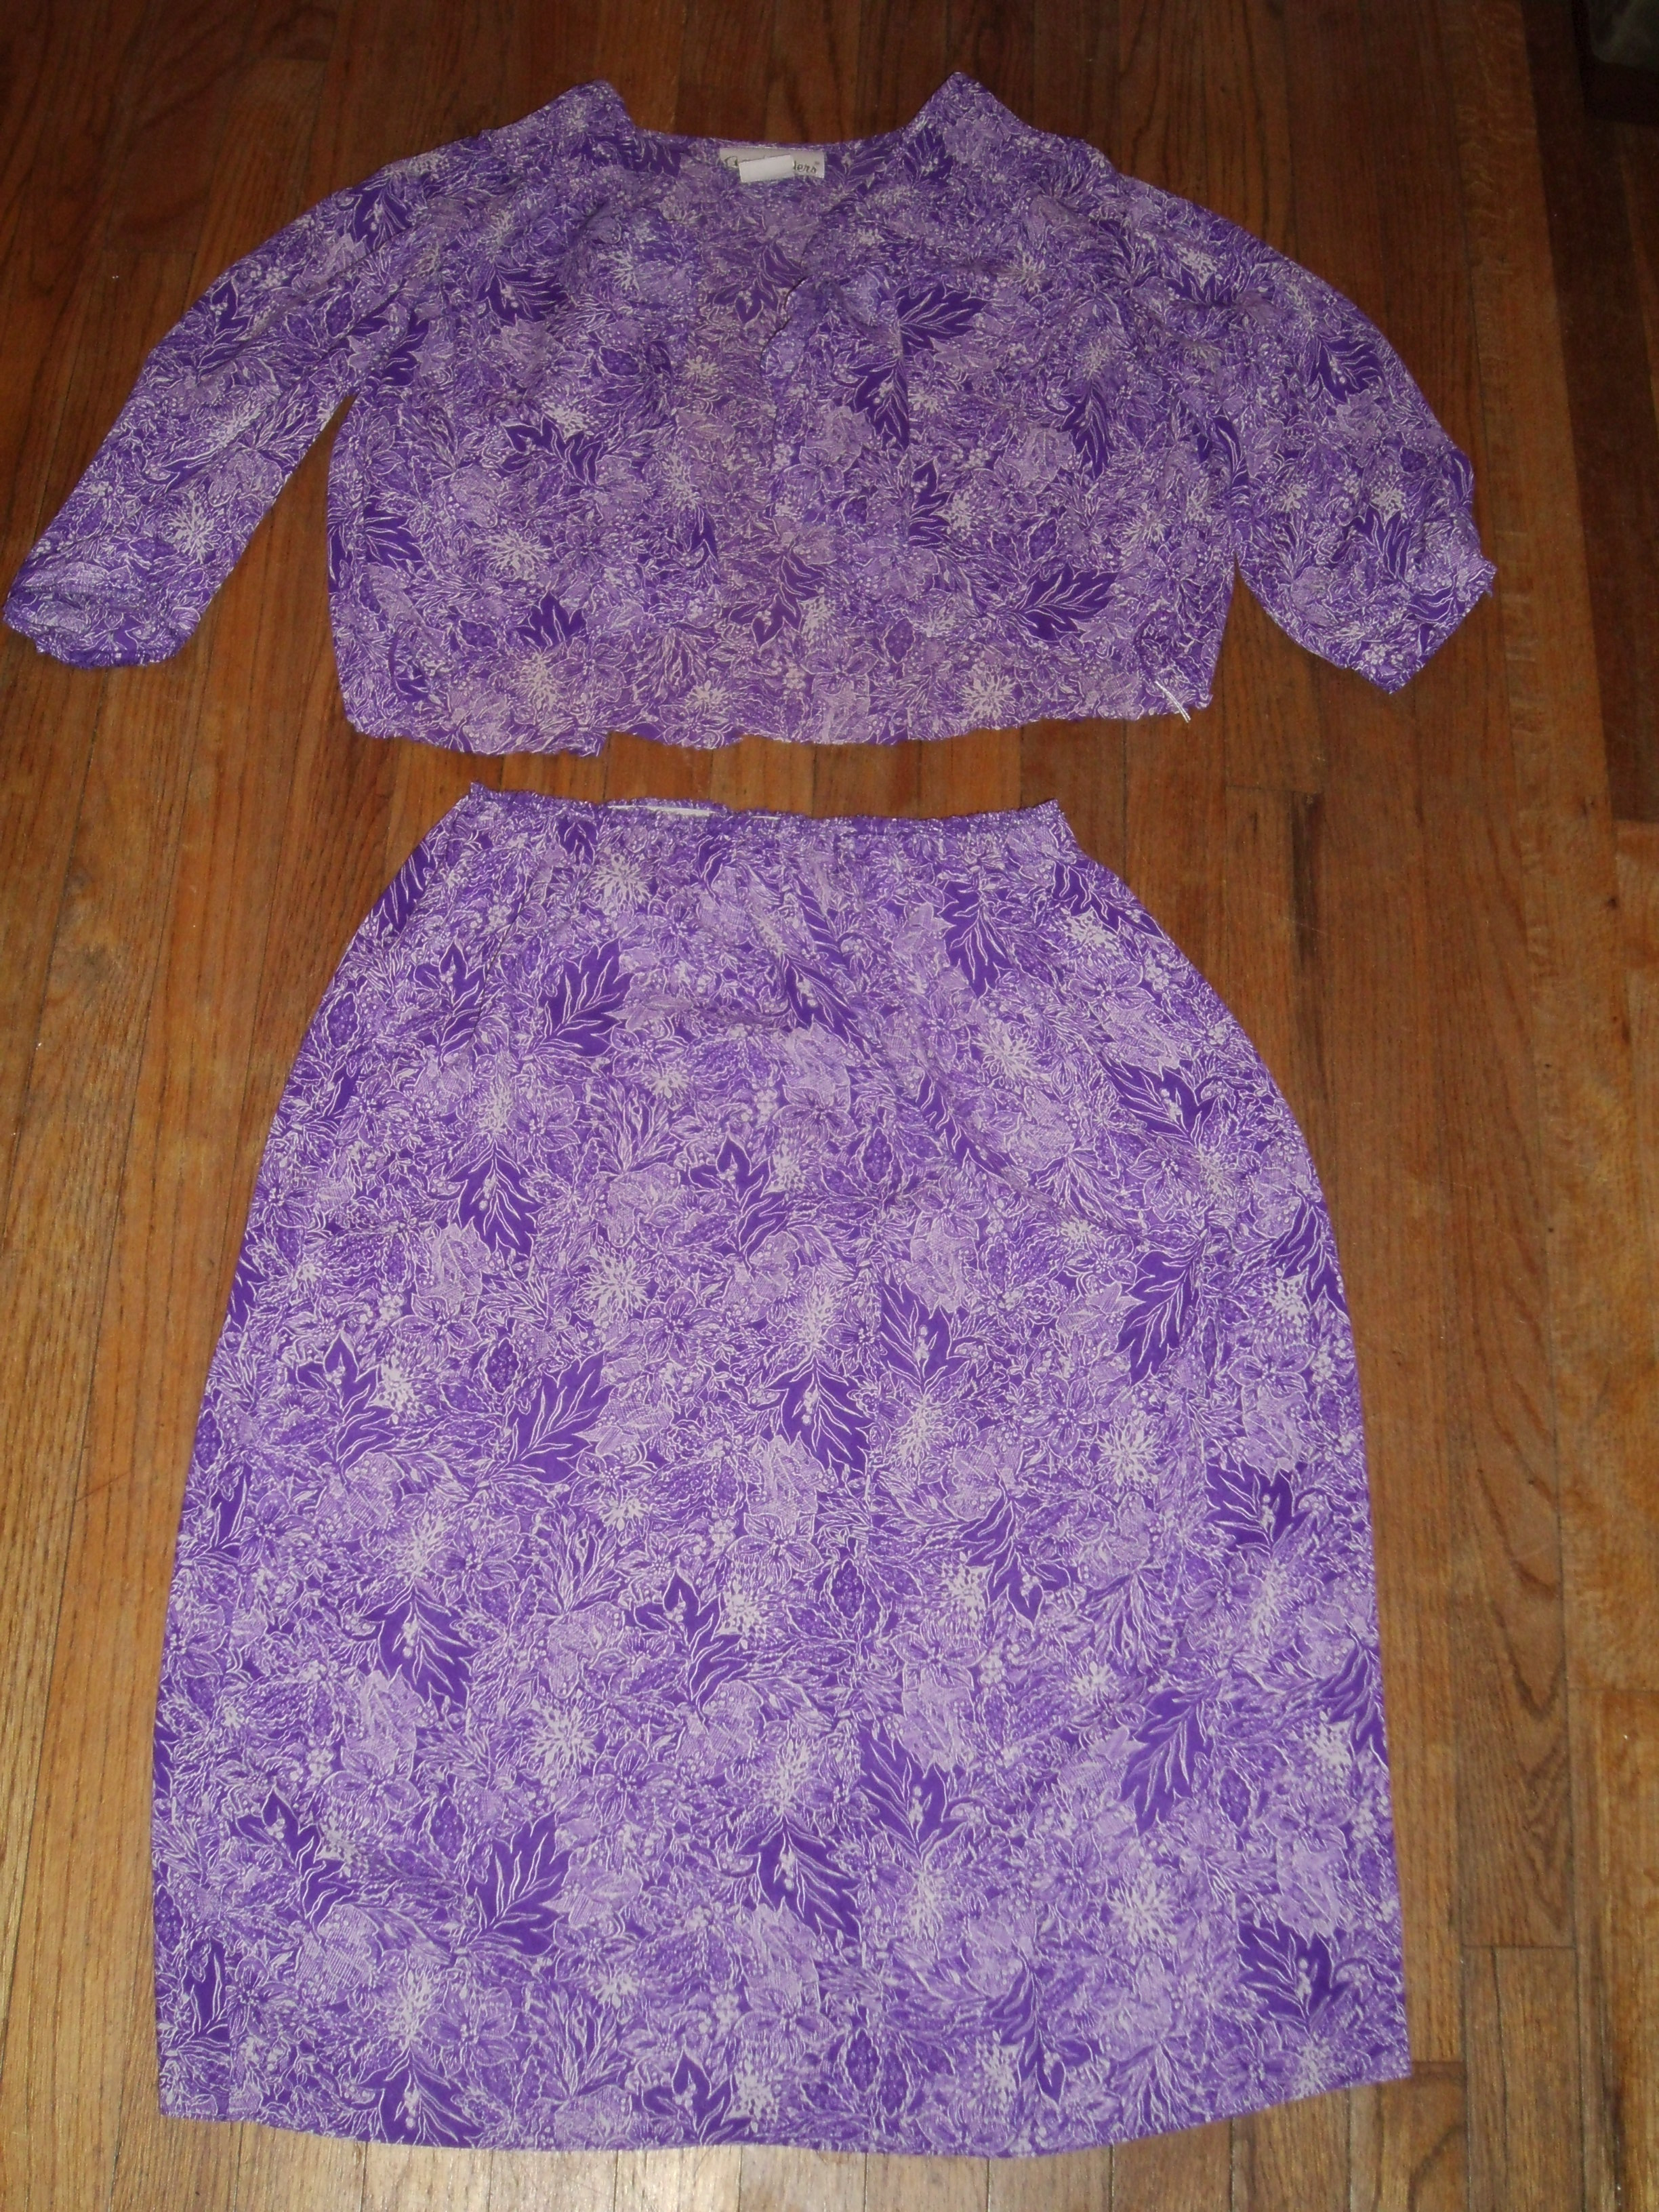 Day 86: Purple Rainforest Dress...Take 2! 4